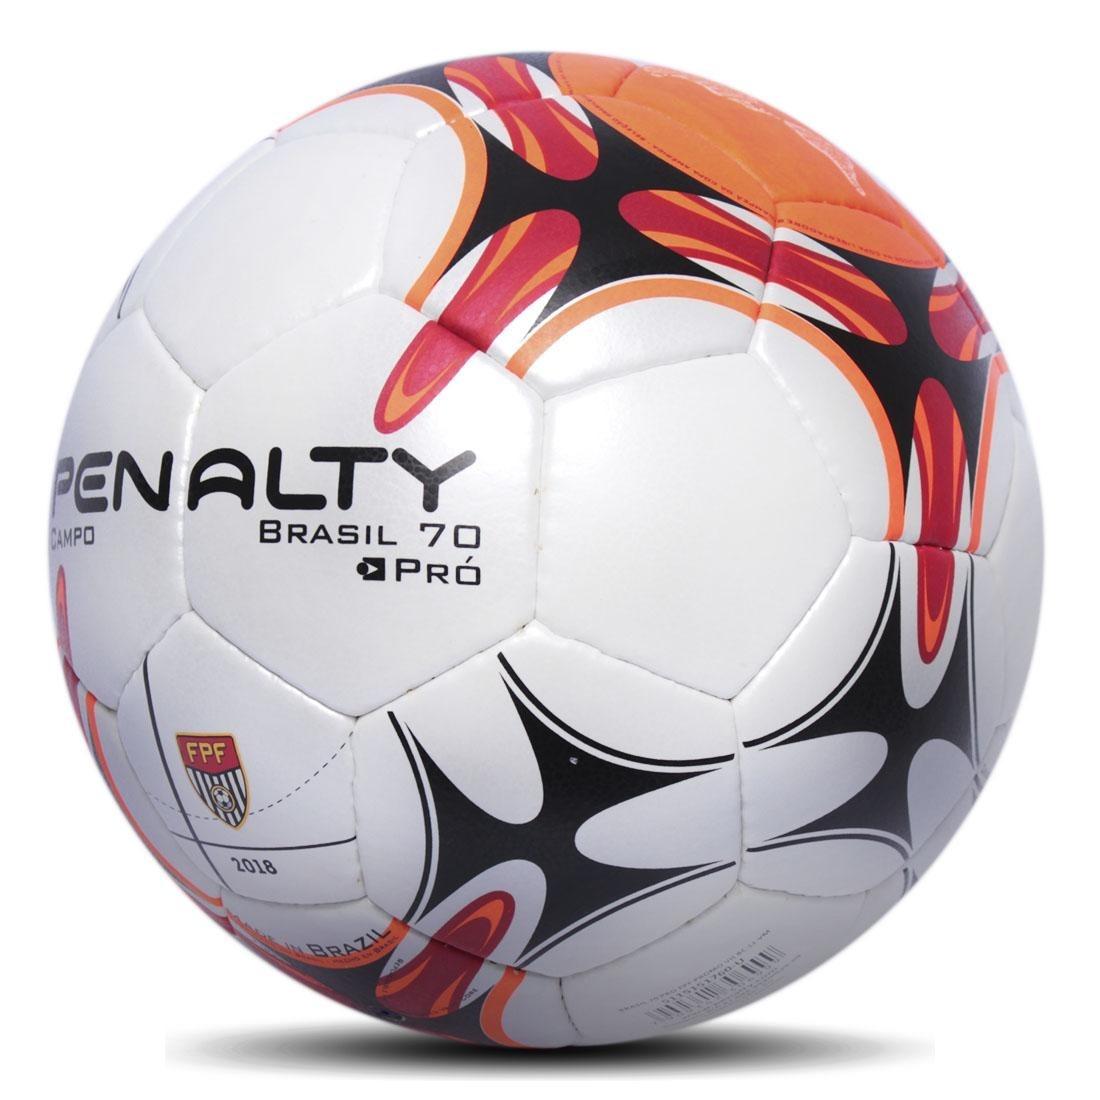 6404a39789 bola campo penalty brasil 70 pró. Carregando zoom.